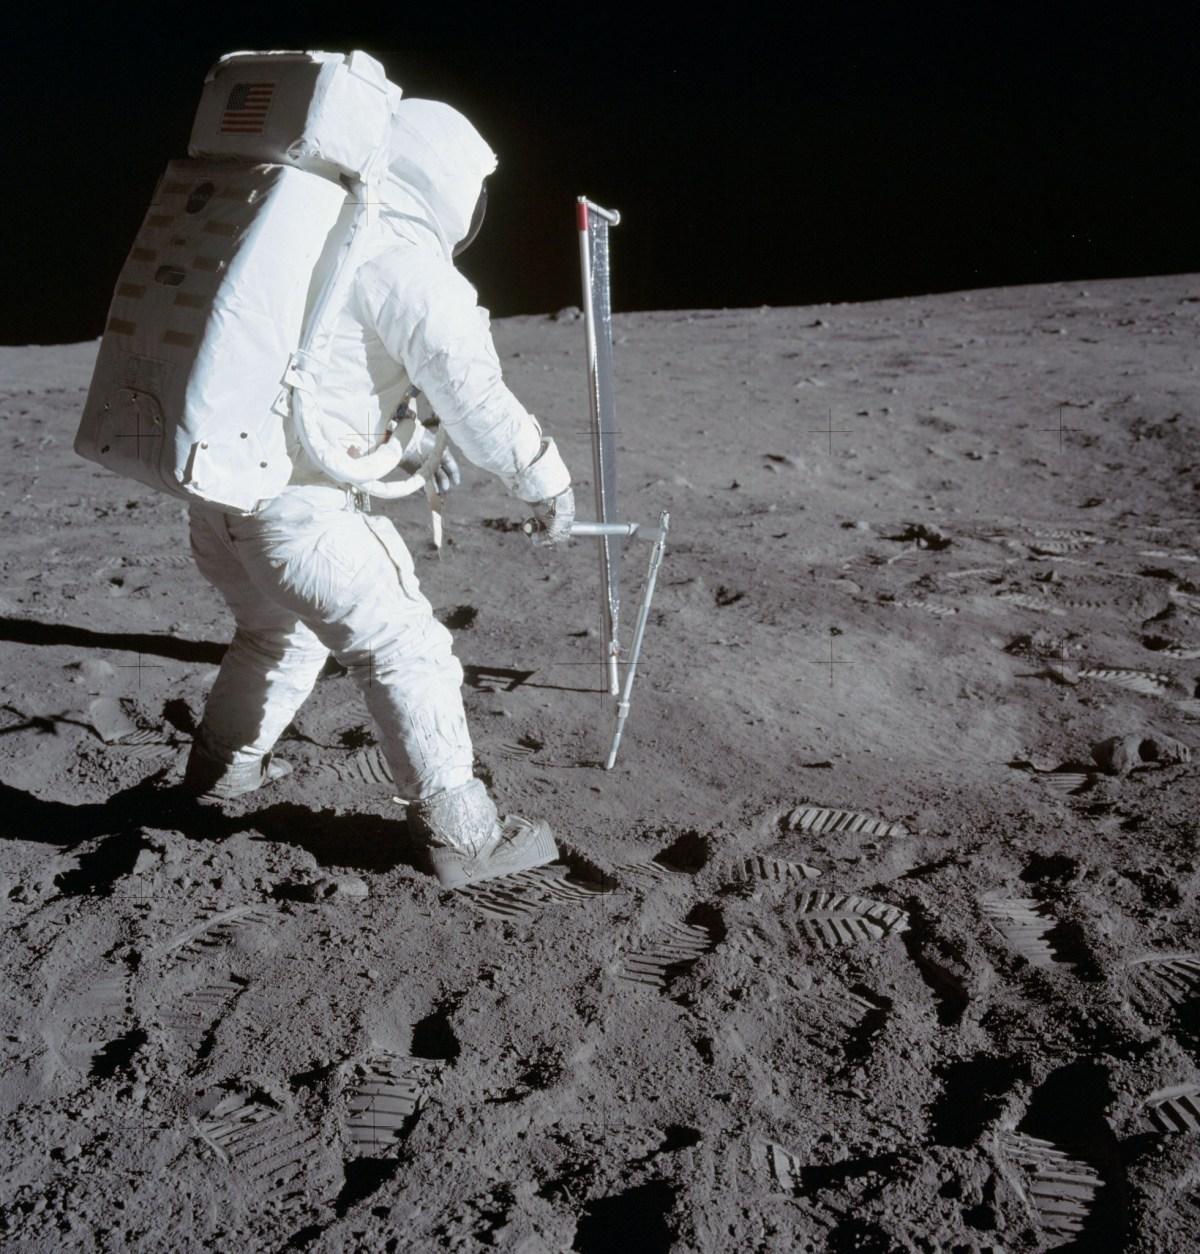 Astronaute Edwin E. Aldrin Jr., pilote du module lunaire durant mission Apollo 11, Lune © NASA - as11-40-5964 - 20 Juillet 1969